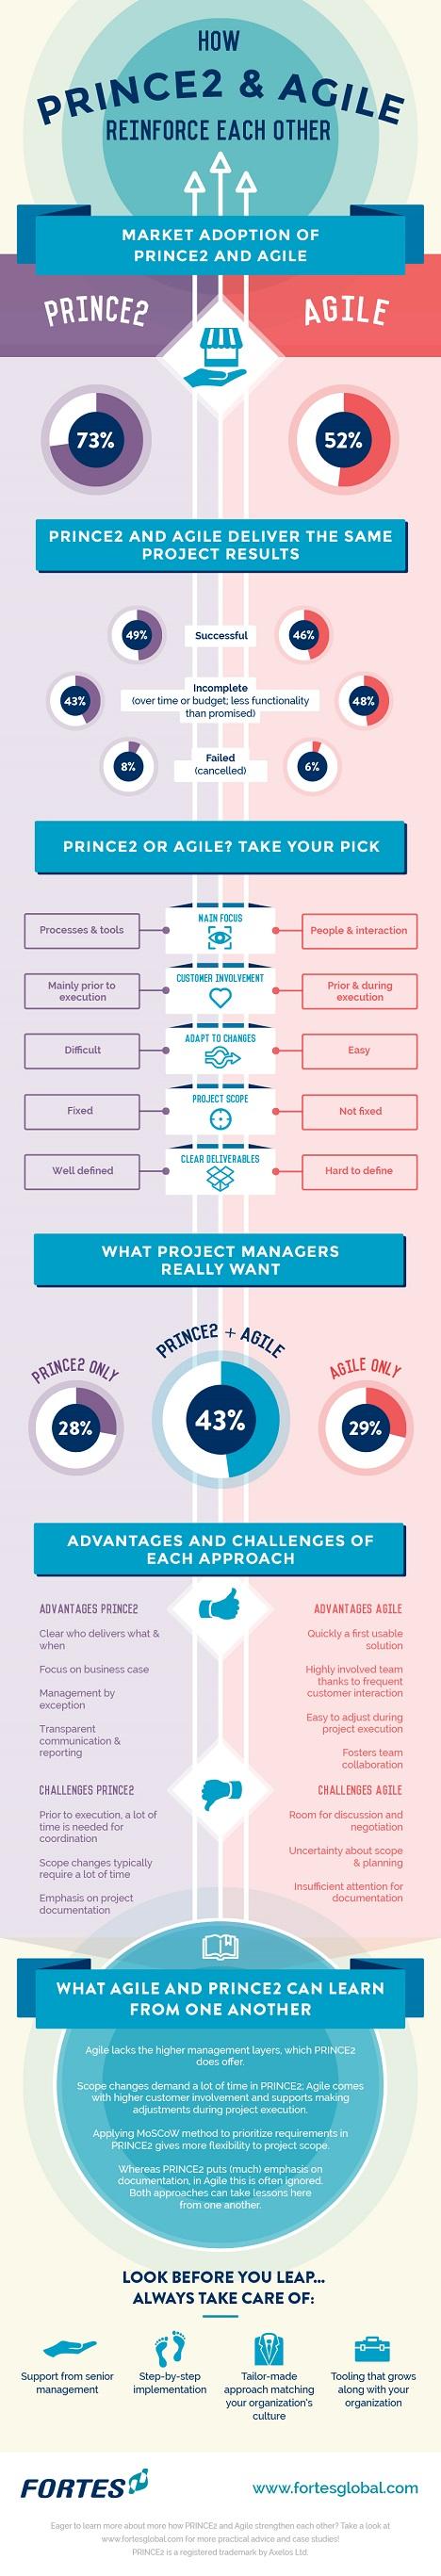 Infographic PRINCE2 vs Agile